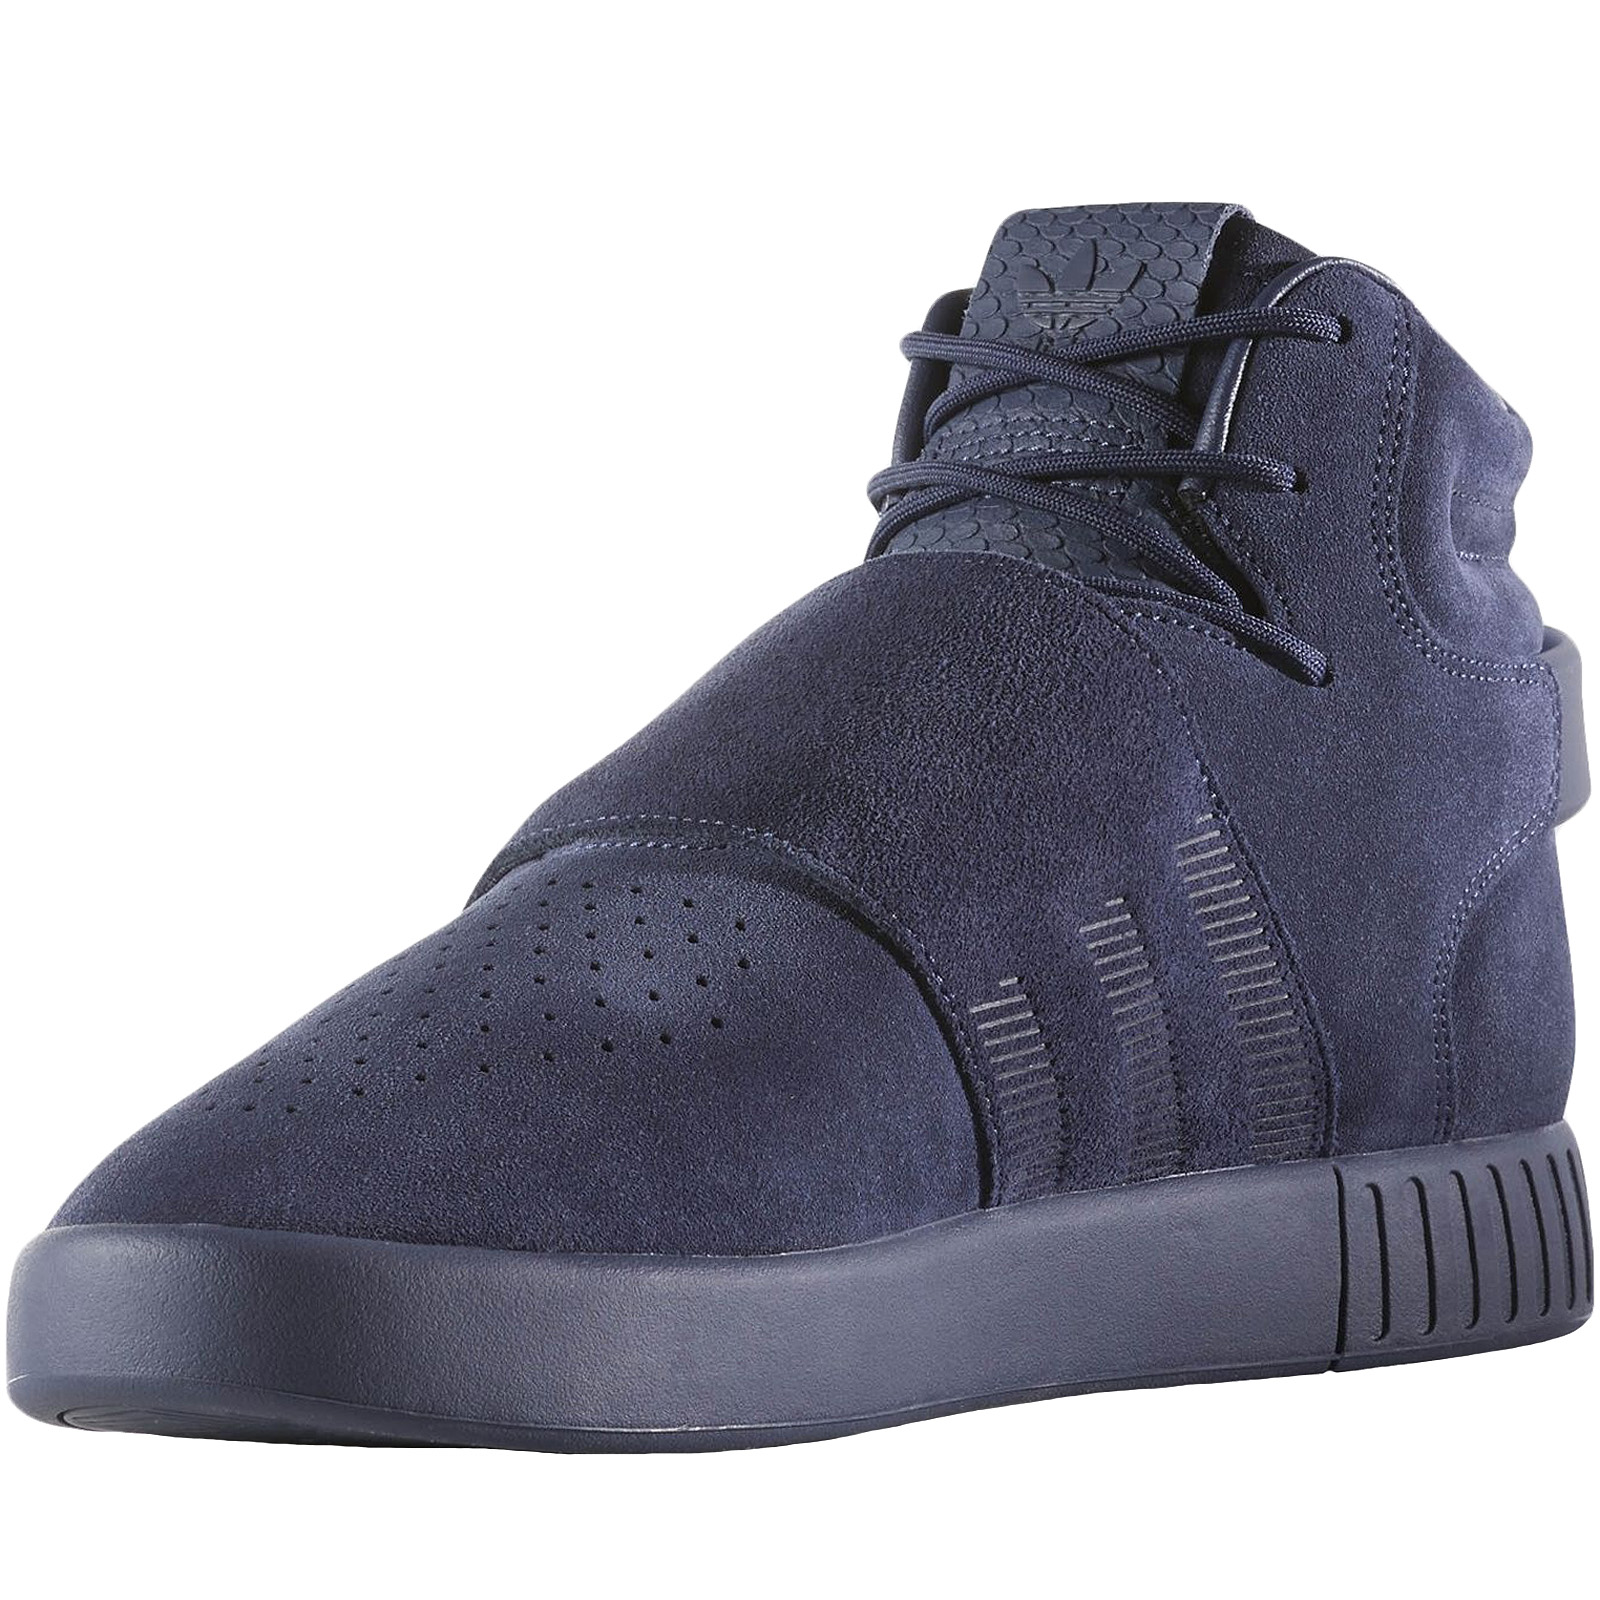 adidas-Originals-Mens-Tubular-Invader-Strap-Casual-Lace-Up-Hi-Top-Trainers-Shoes thumbnail 11